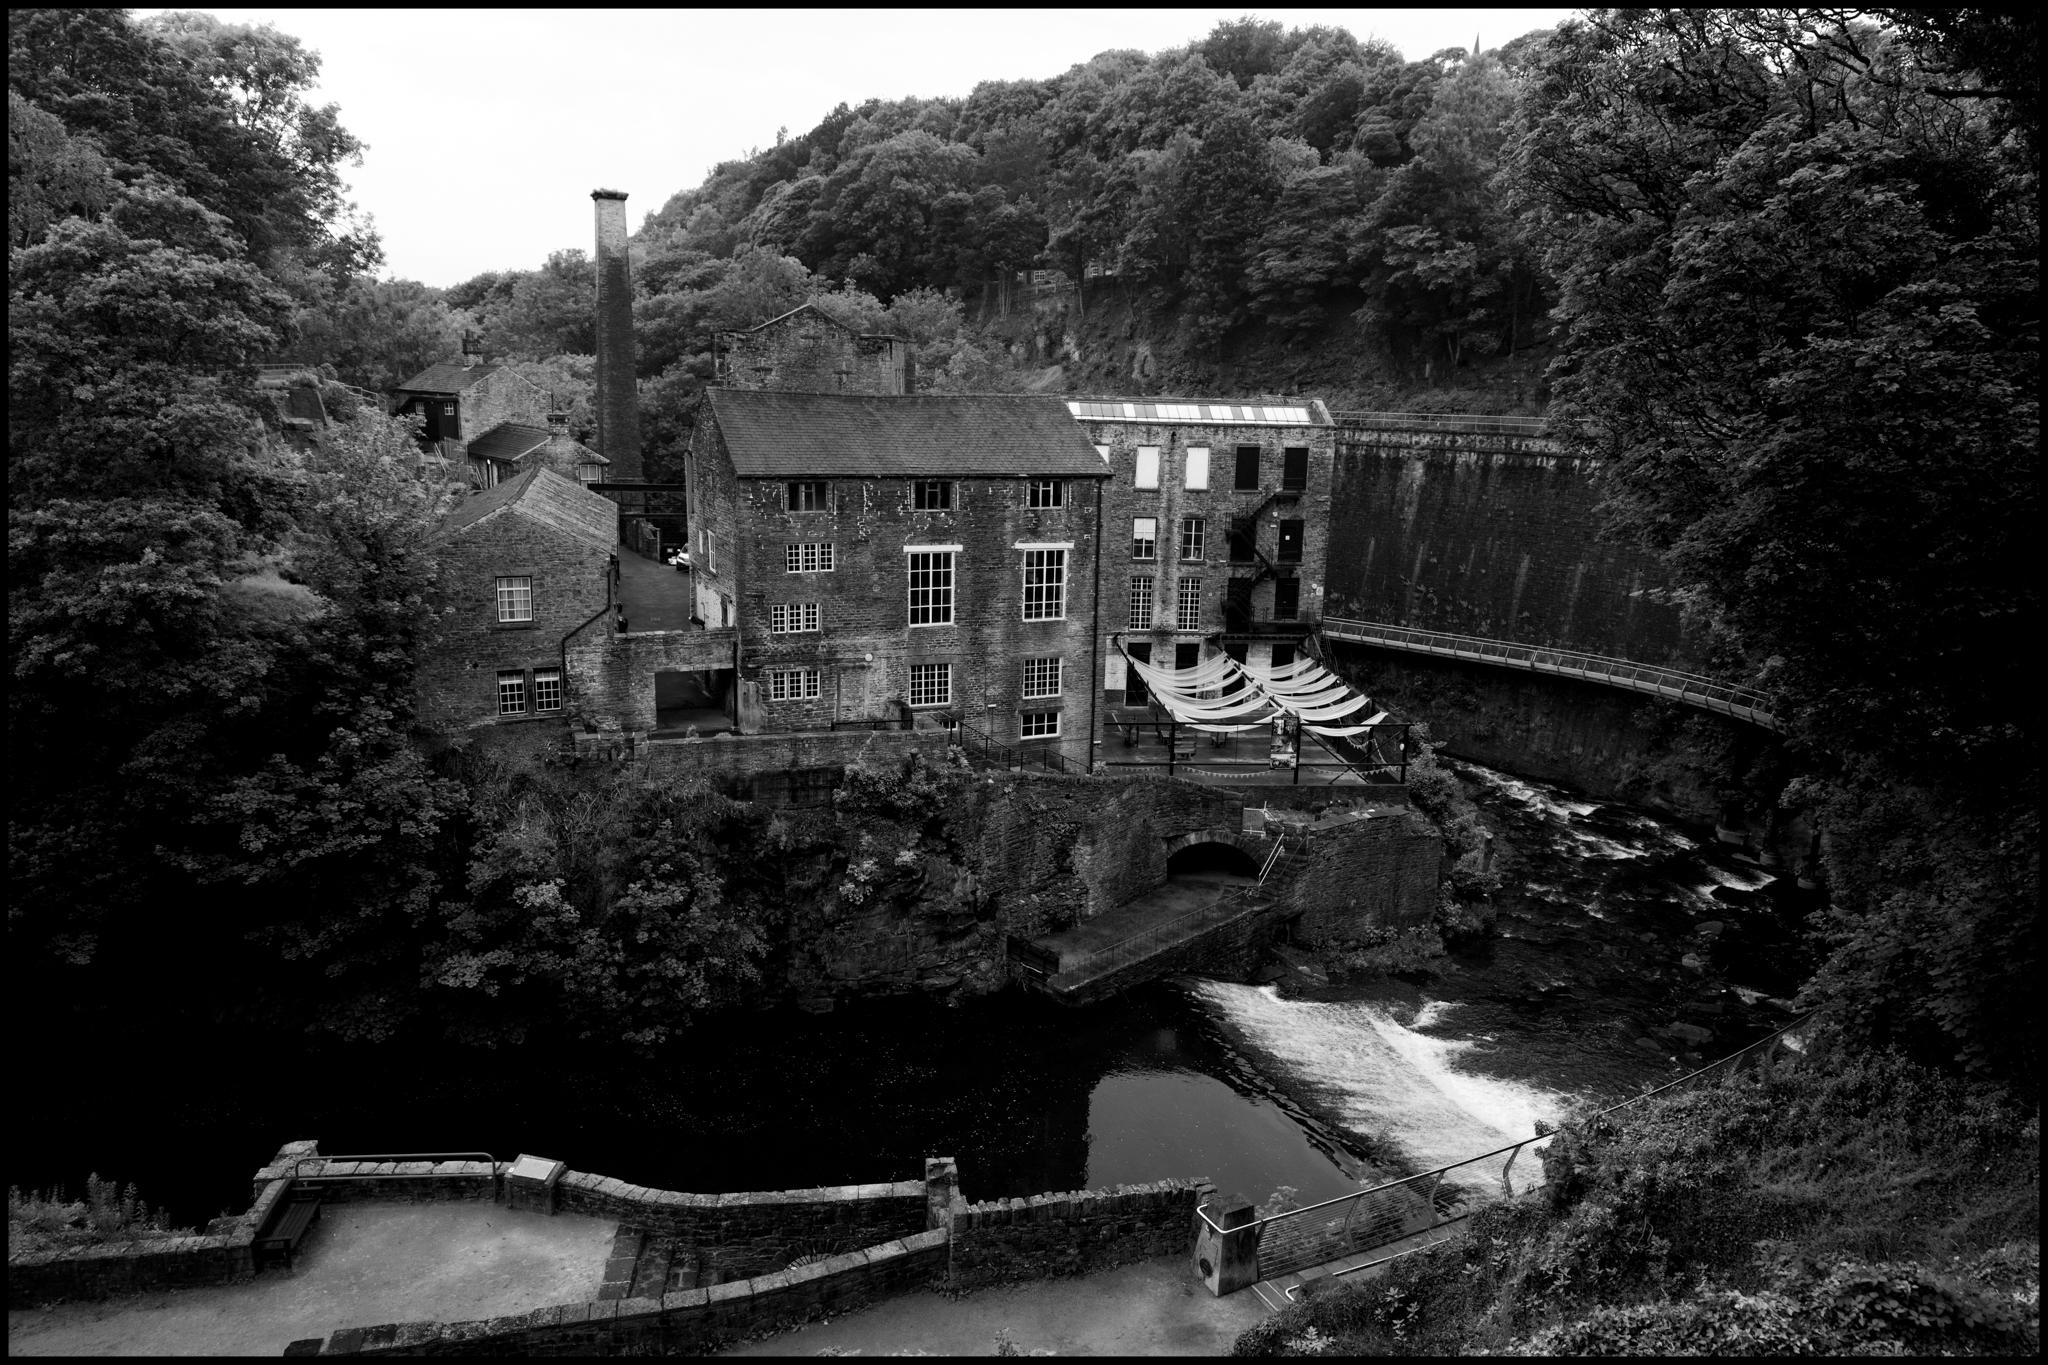 24 June 2019 - Old Mill, New Mills UK